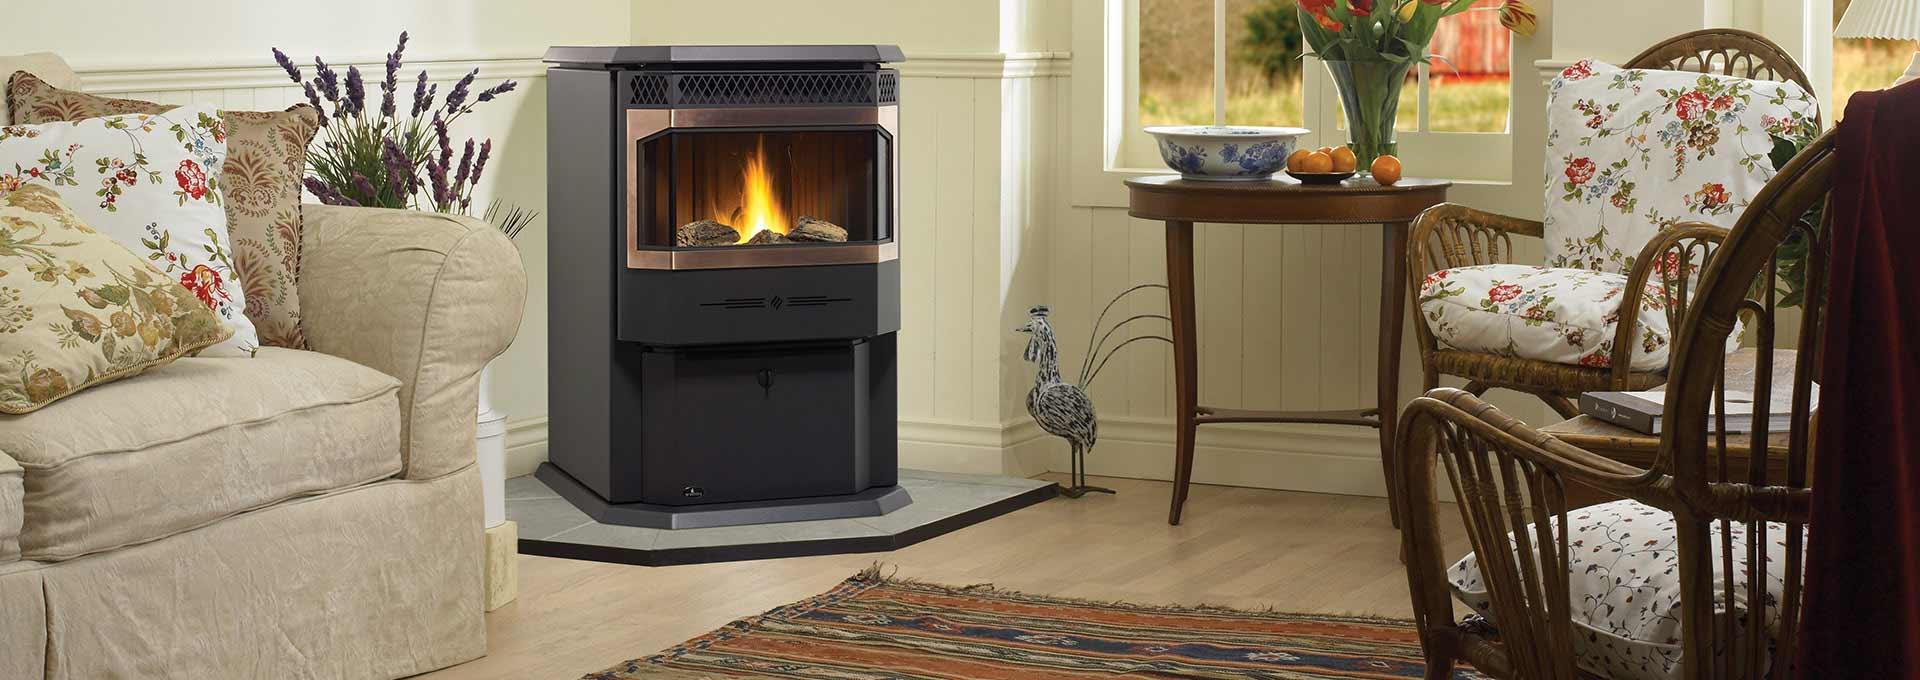 pellet stoves regency fireplace products